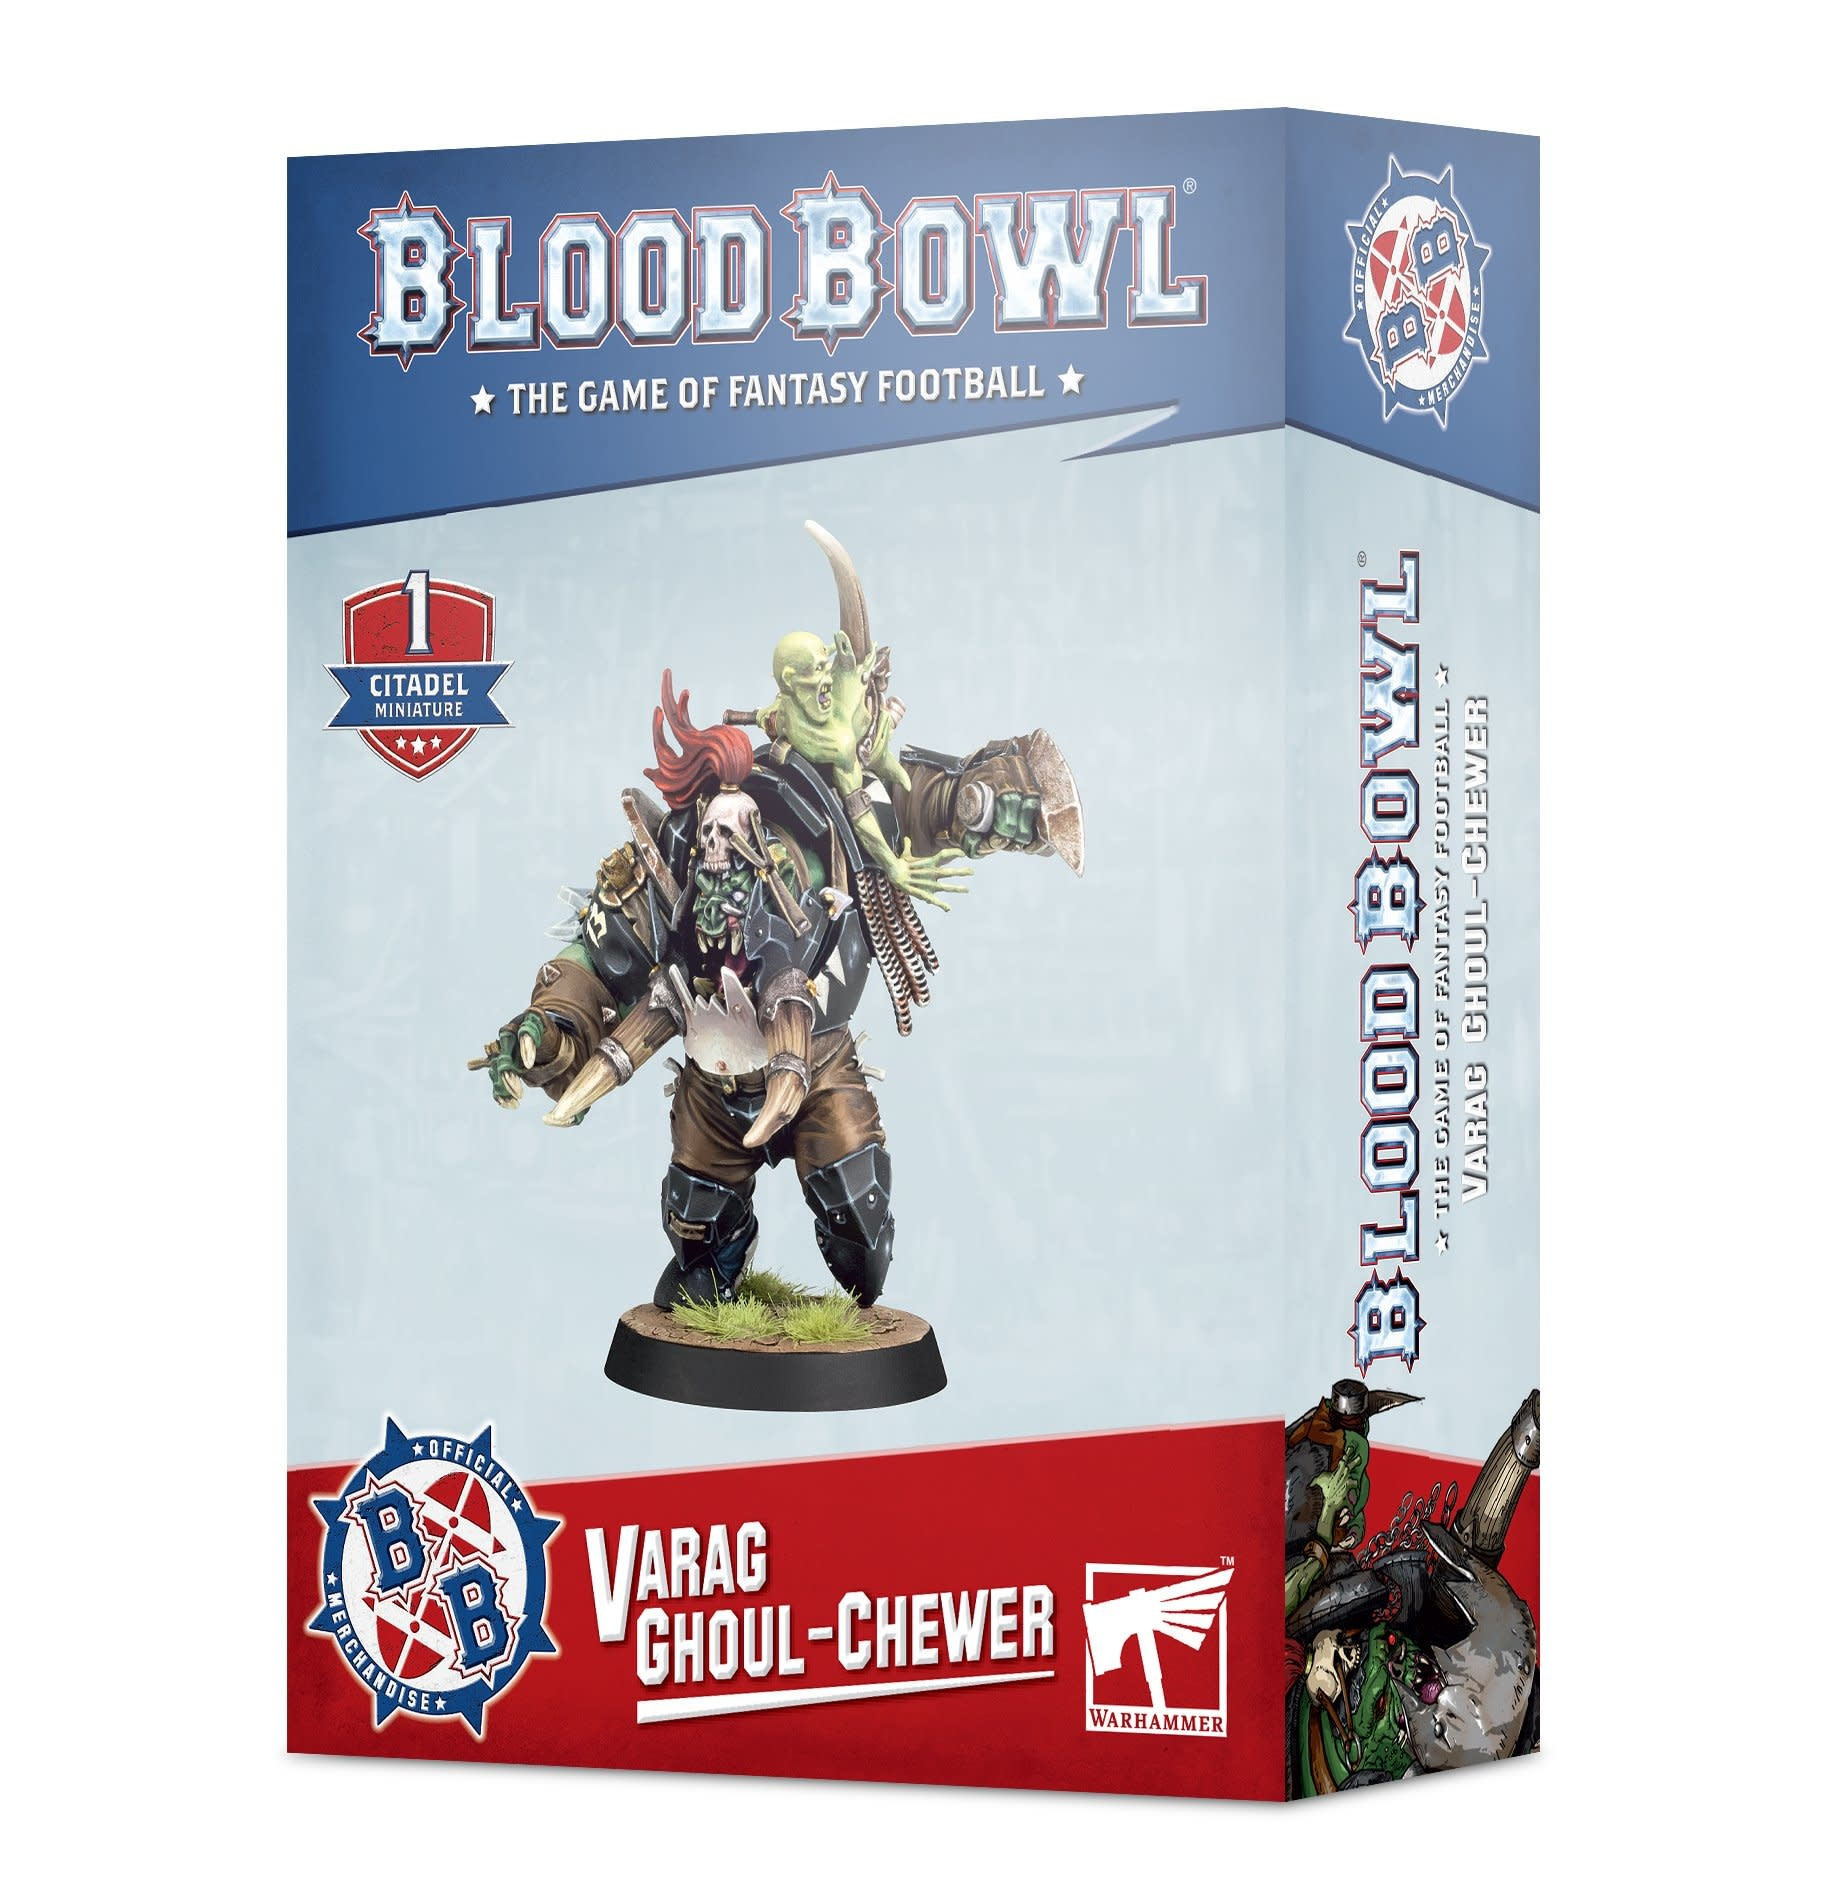 Games-Workshop Blood Bowl: Varag Ghoul-chewer